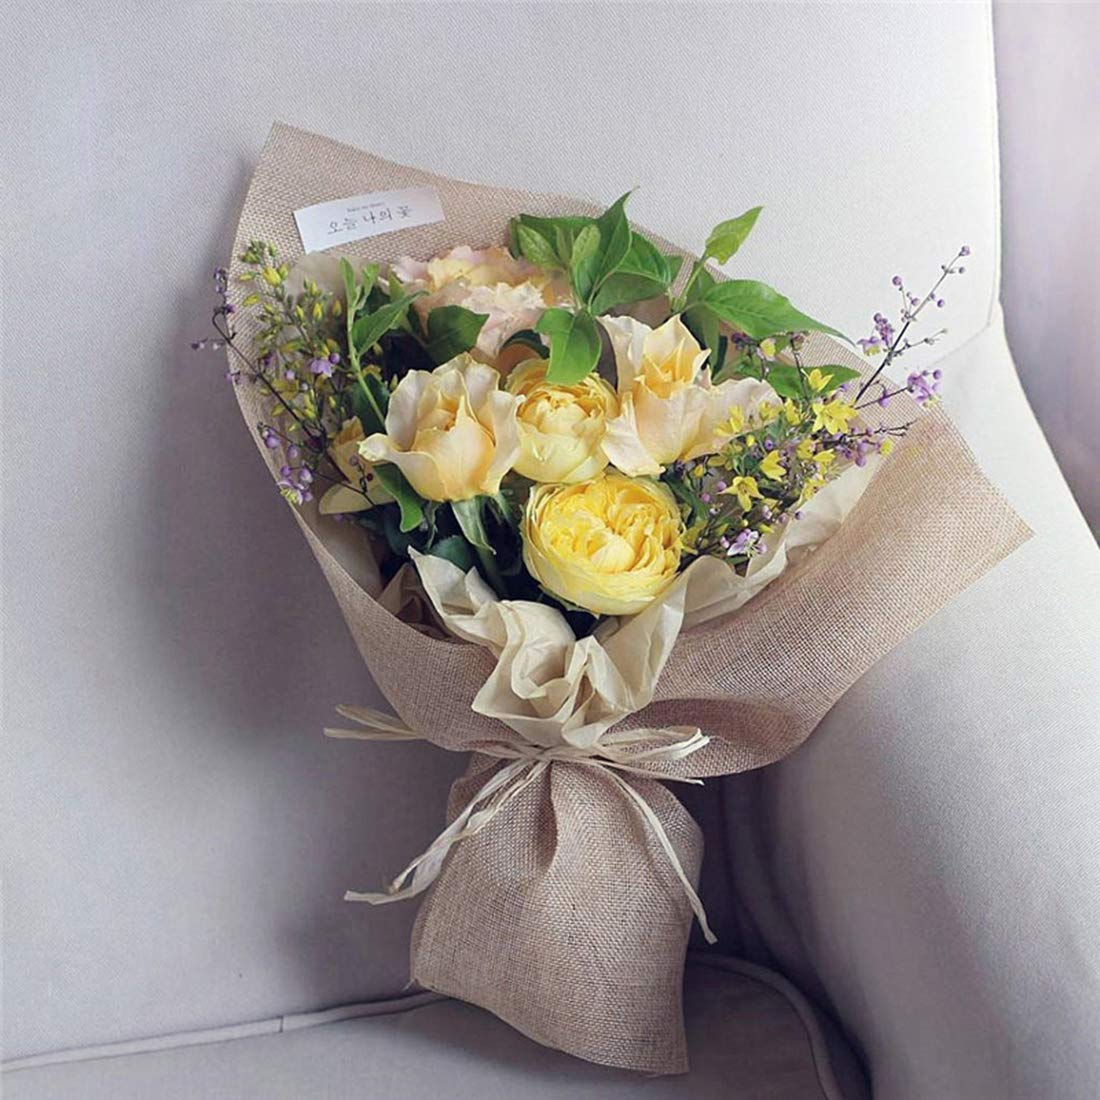 Lawei 5 Pack x 50g Natural Raffia Bundles for Florist Crafts Decoration Weaving Garden Totally 250g